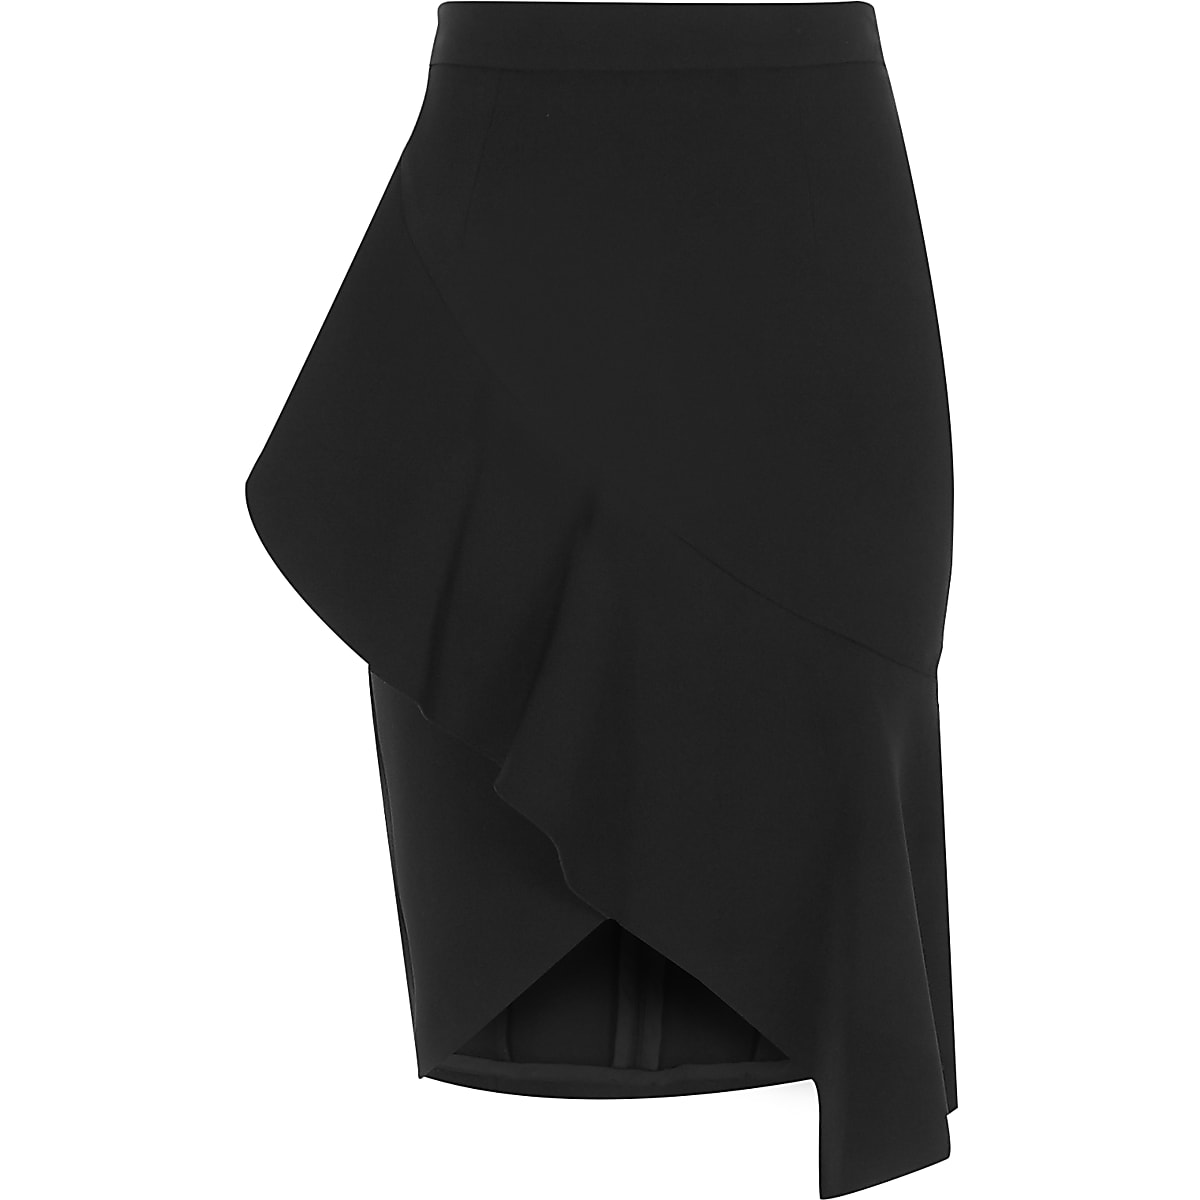 Black asymmetric frill pencil skirt